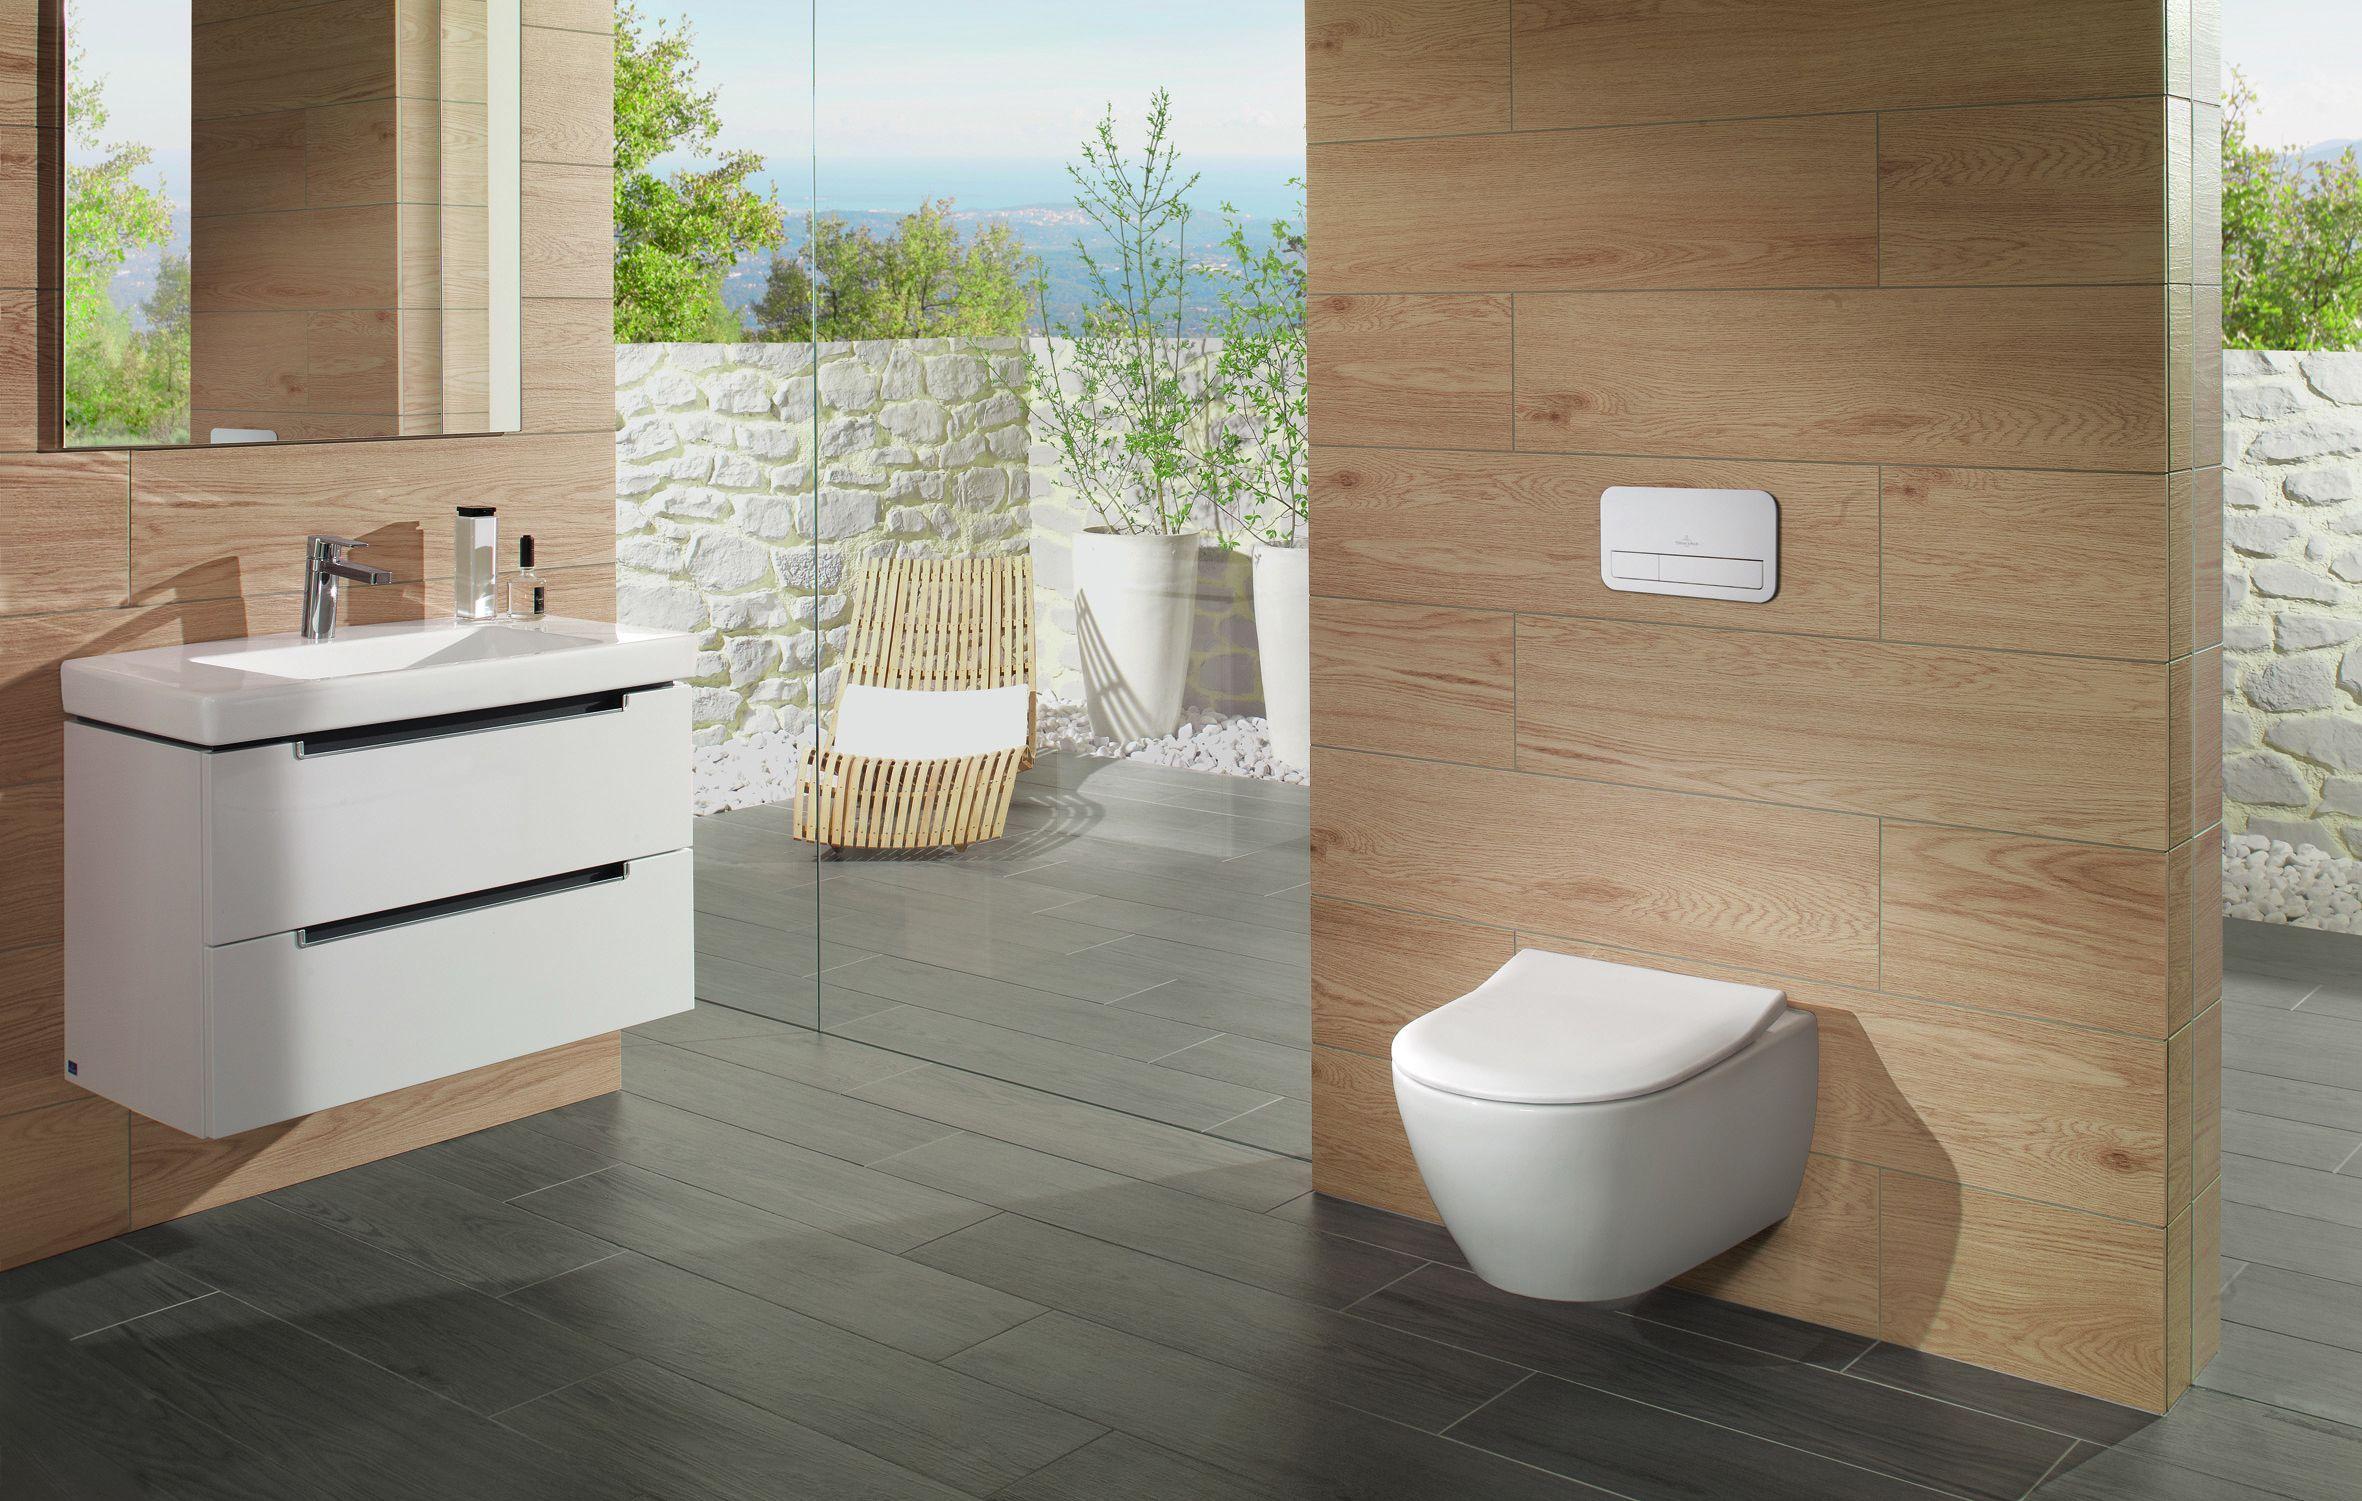 Badezimmer villeroy boch for Reuter badplaner